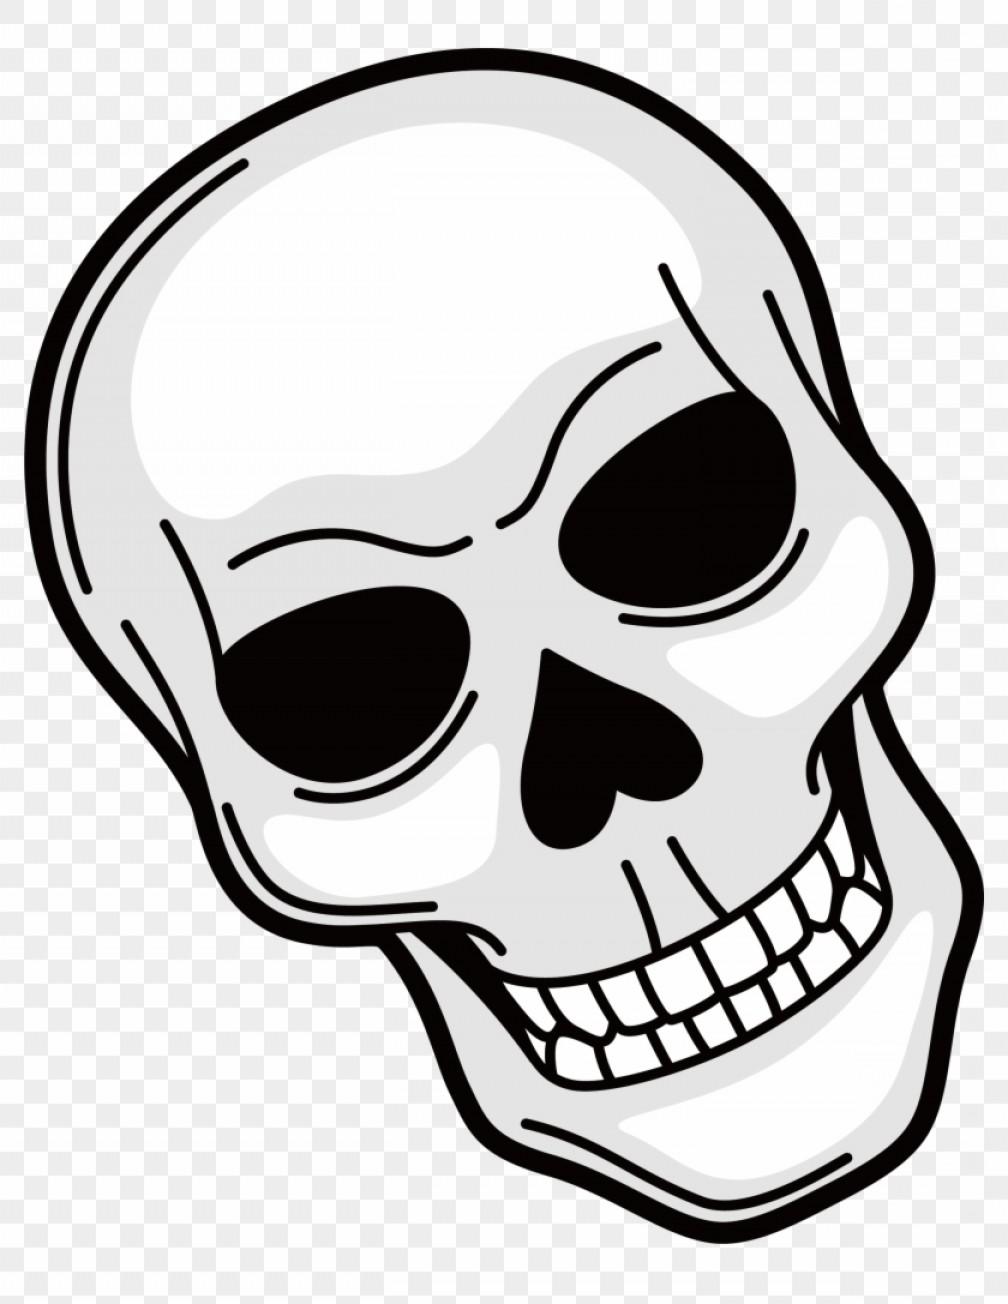 Miimamghskull Drawing Clip Art Skull Vector Png.